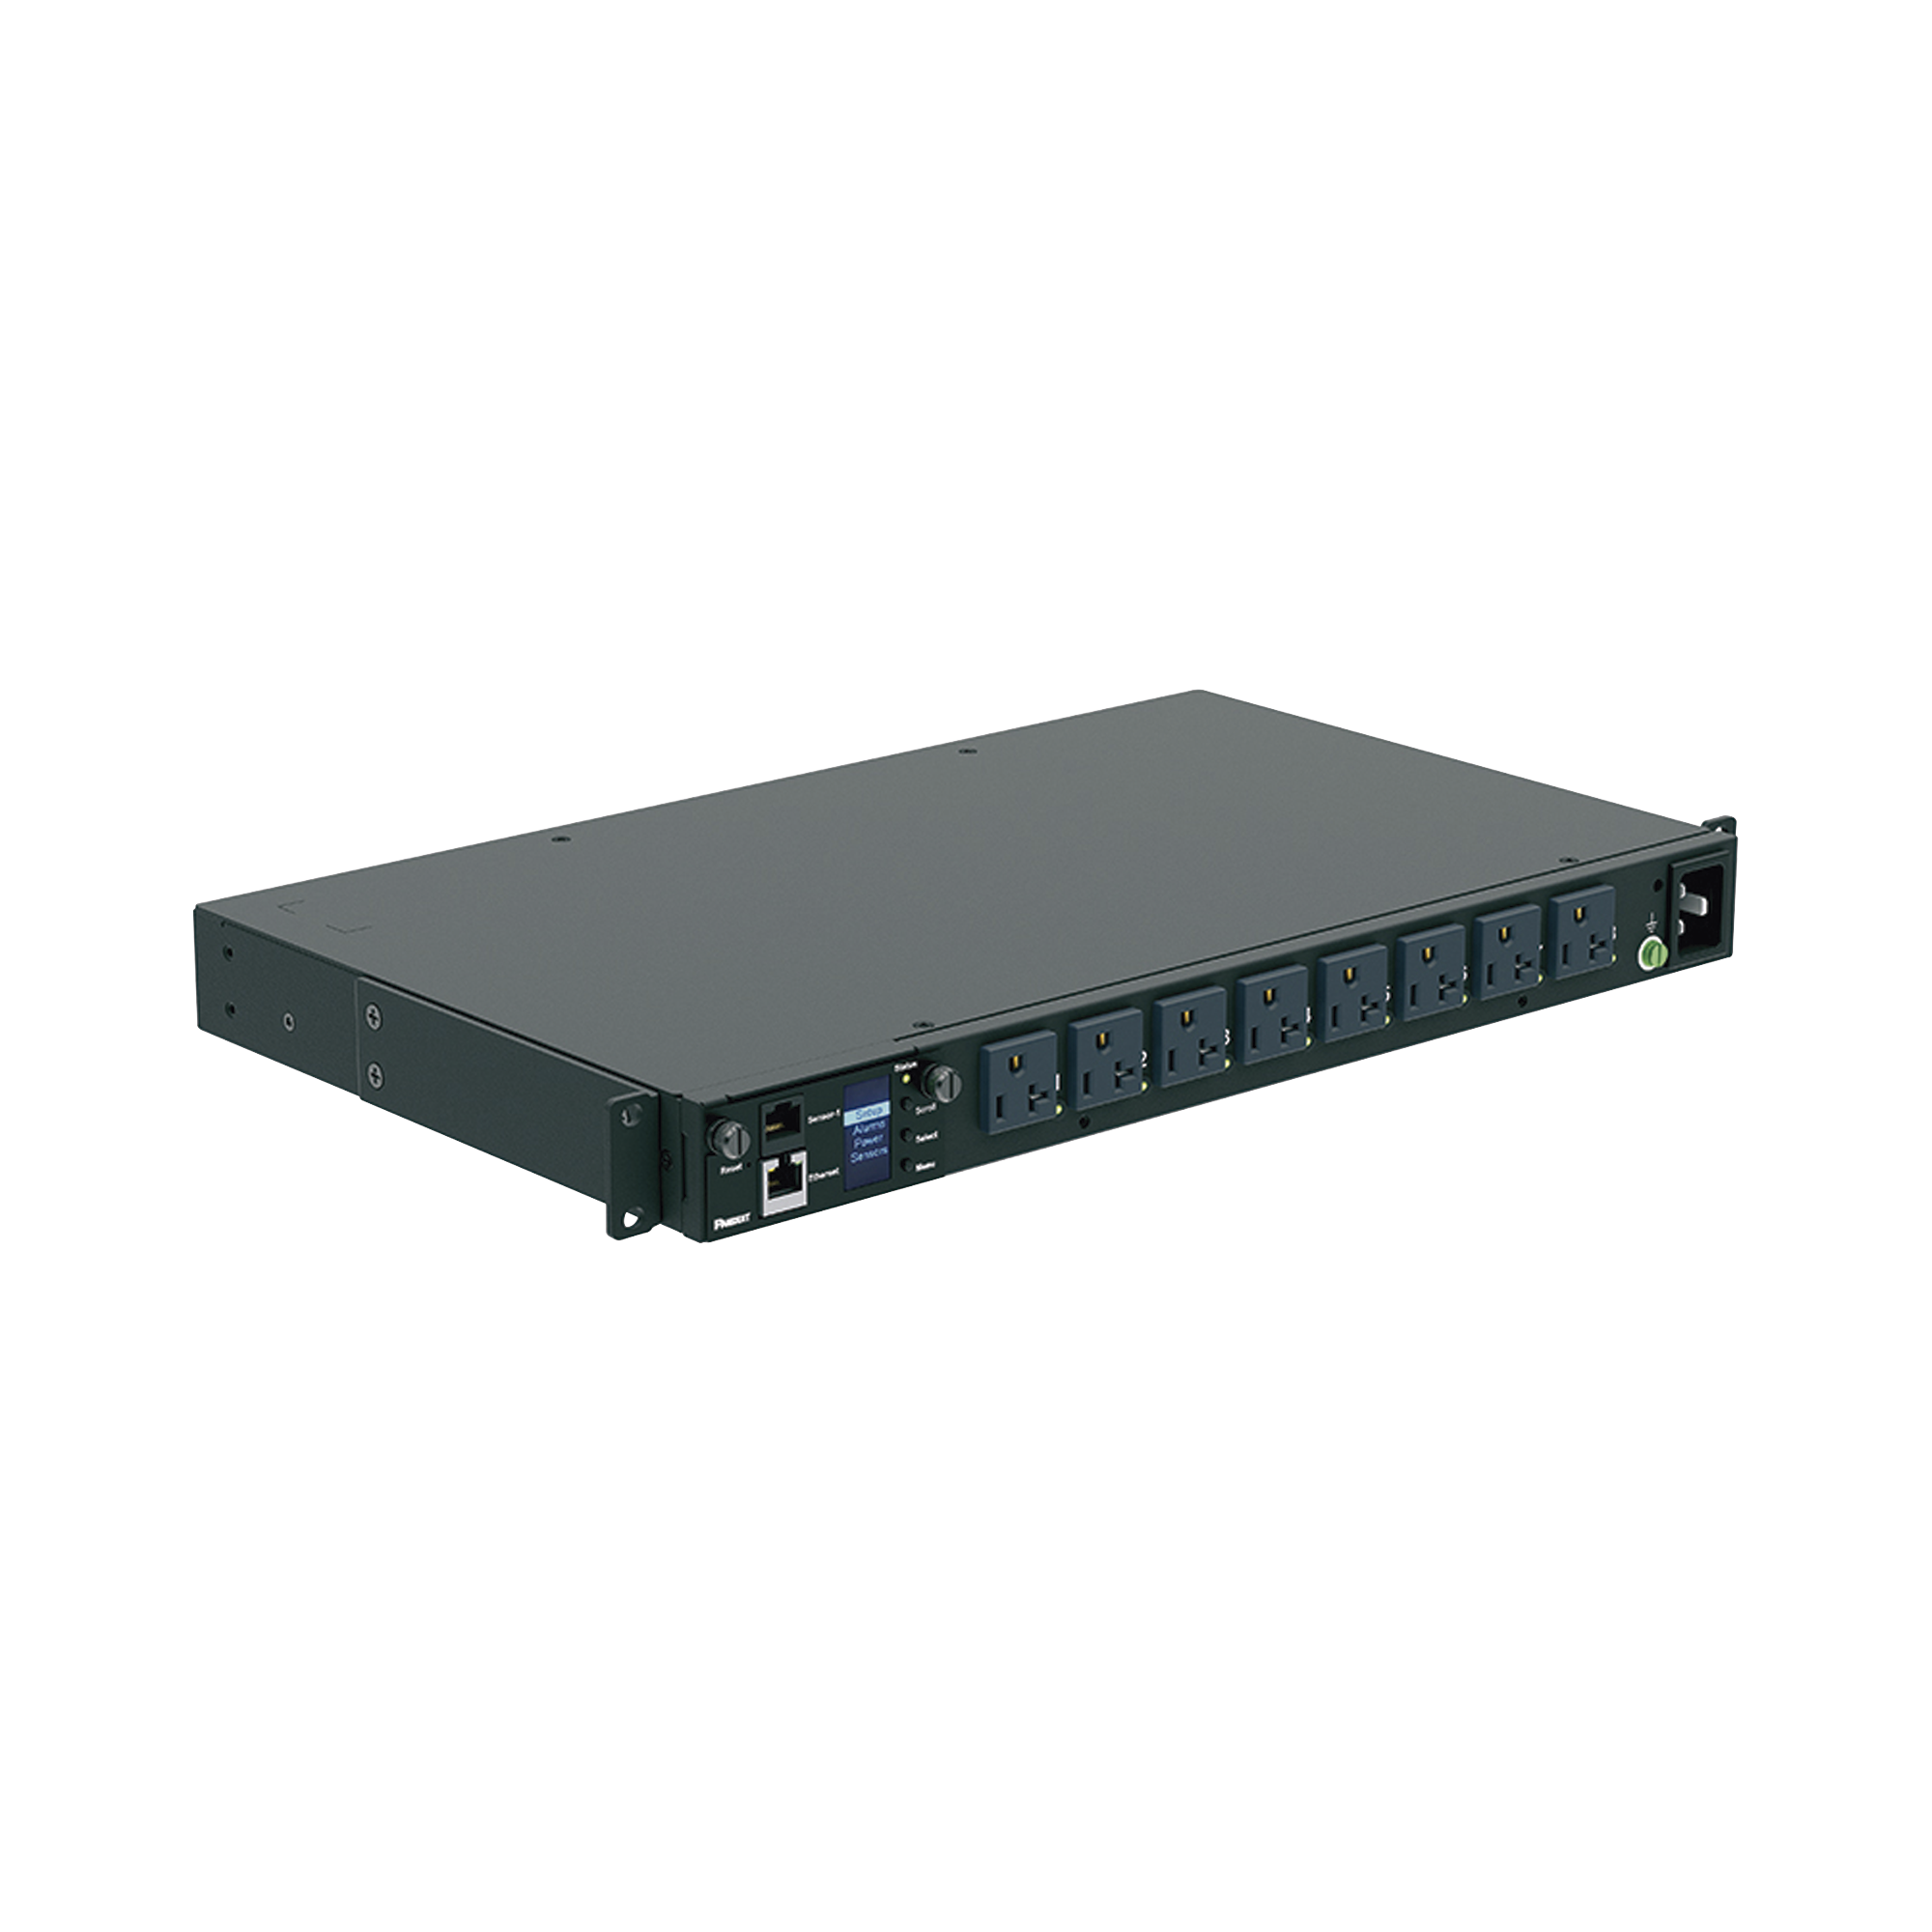 PDU Switchable y Monitoreable por Toma (MS) para Distribución de Energía, Enchufe de Entrada NEMA 5-15P, Con 8 Salidas 5-20R, Horizontal 19in, 120 Vca, 15 Amp, 1UR